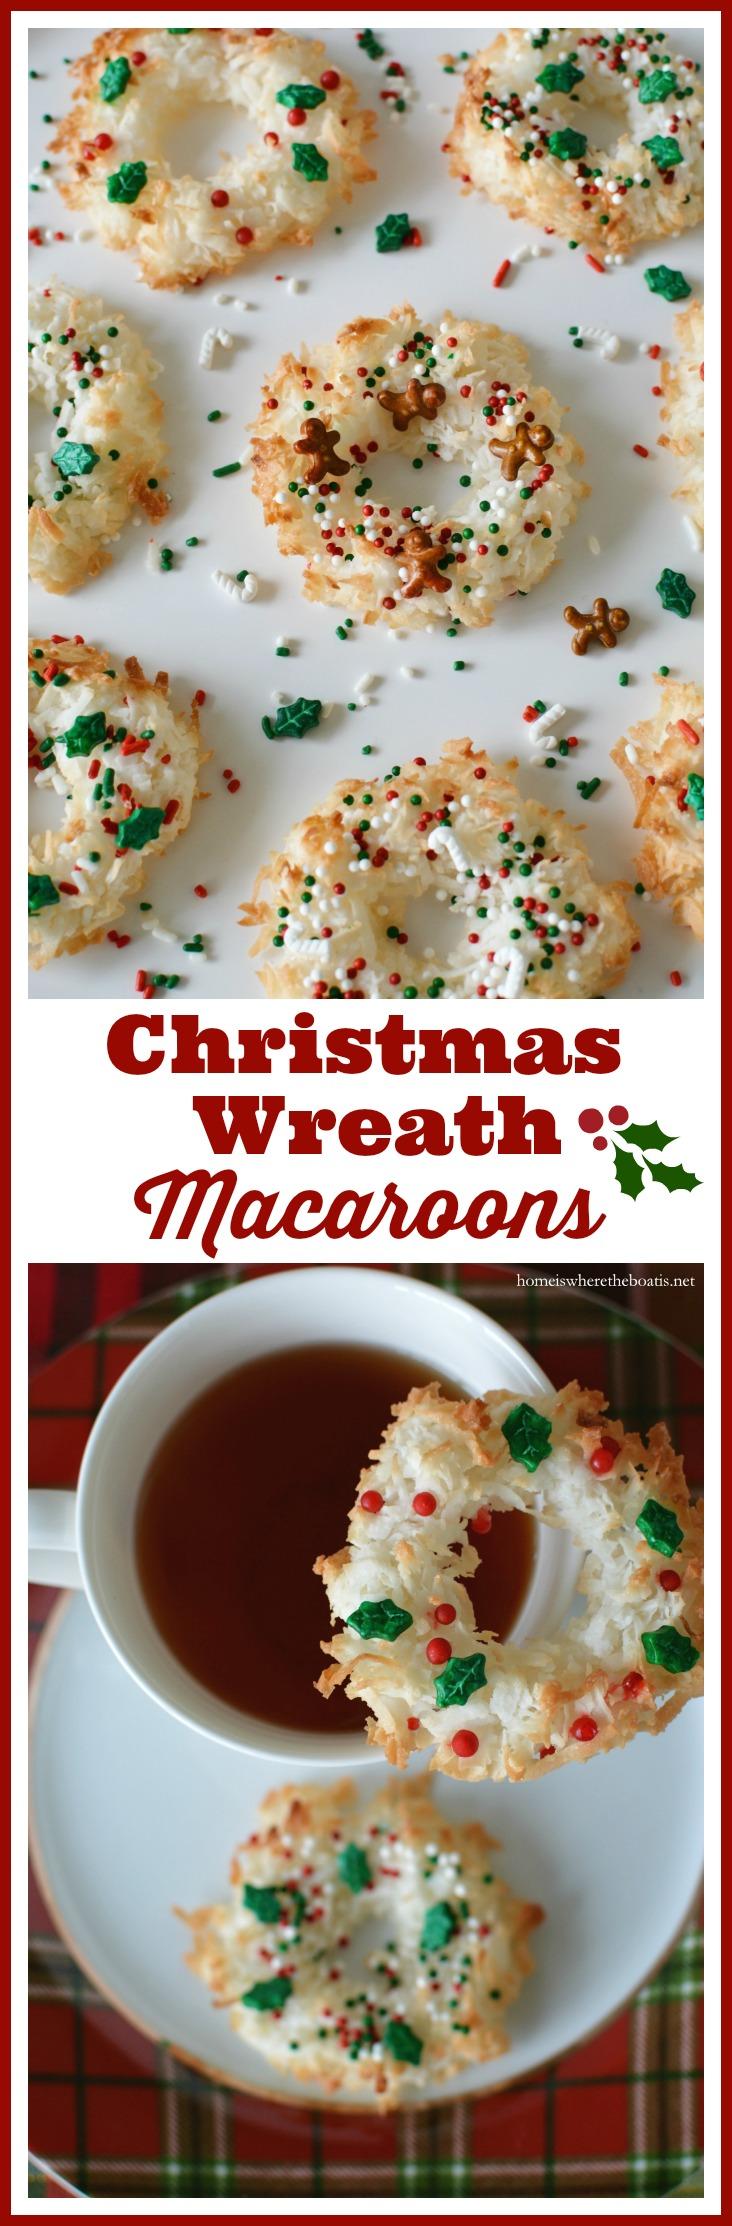 Christmas Wreath Macaroons